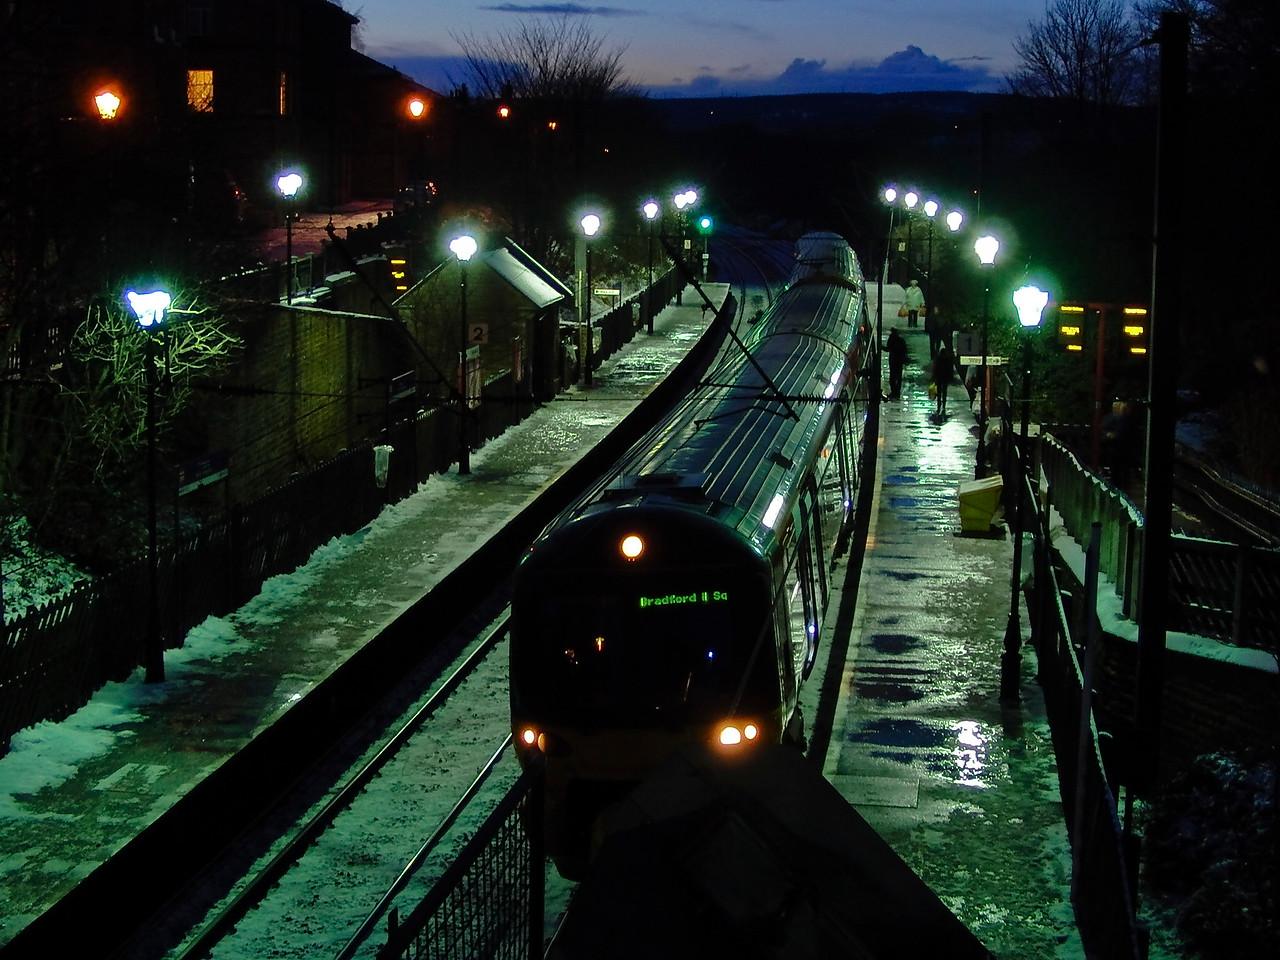 Saltaire Railway Station